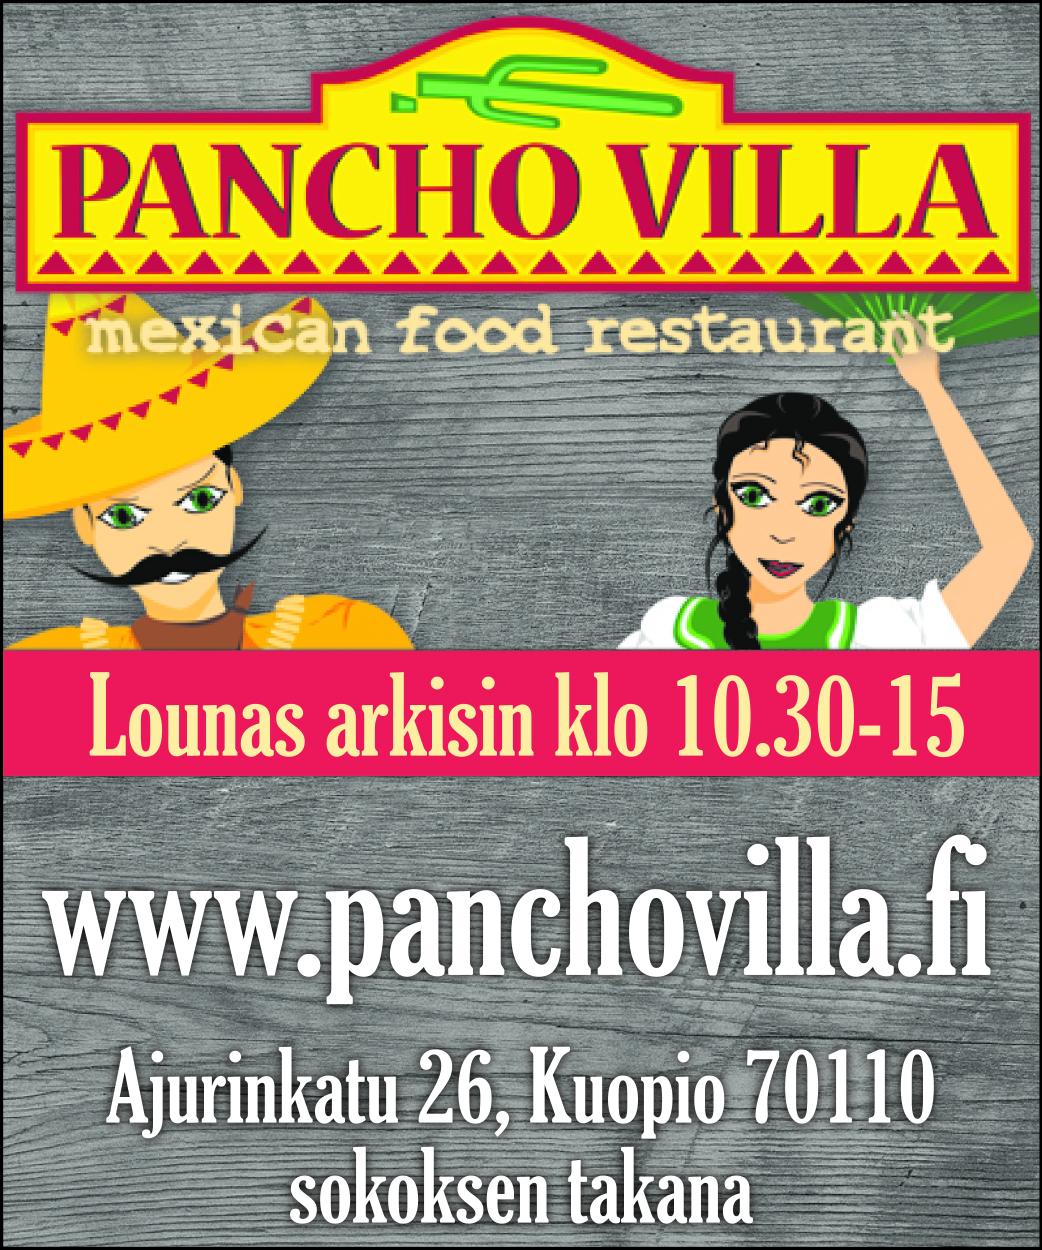 pancho-villa-banneri-pieni.jpg